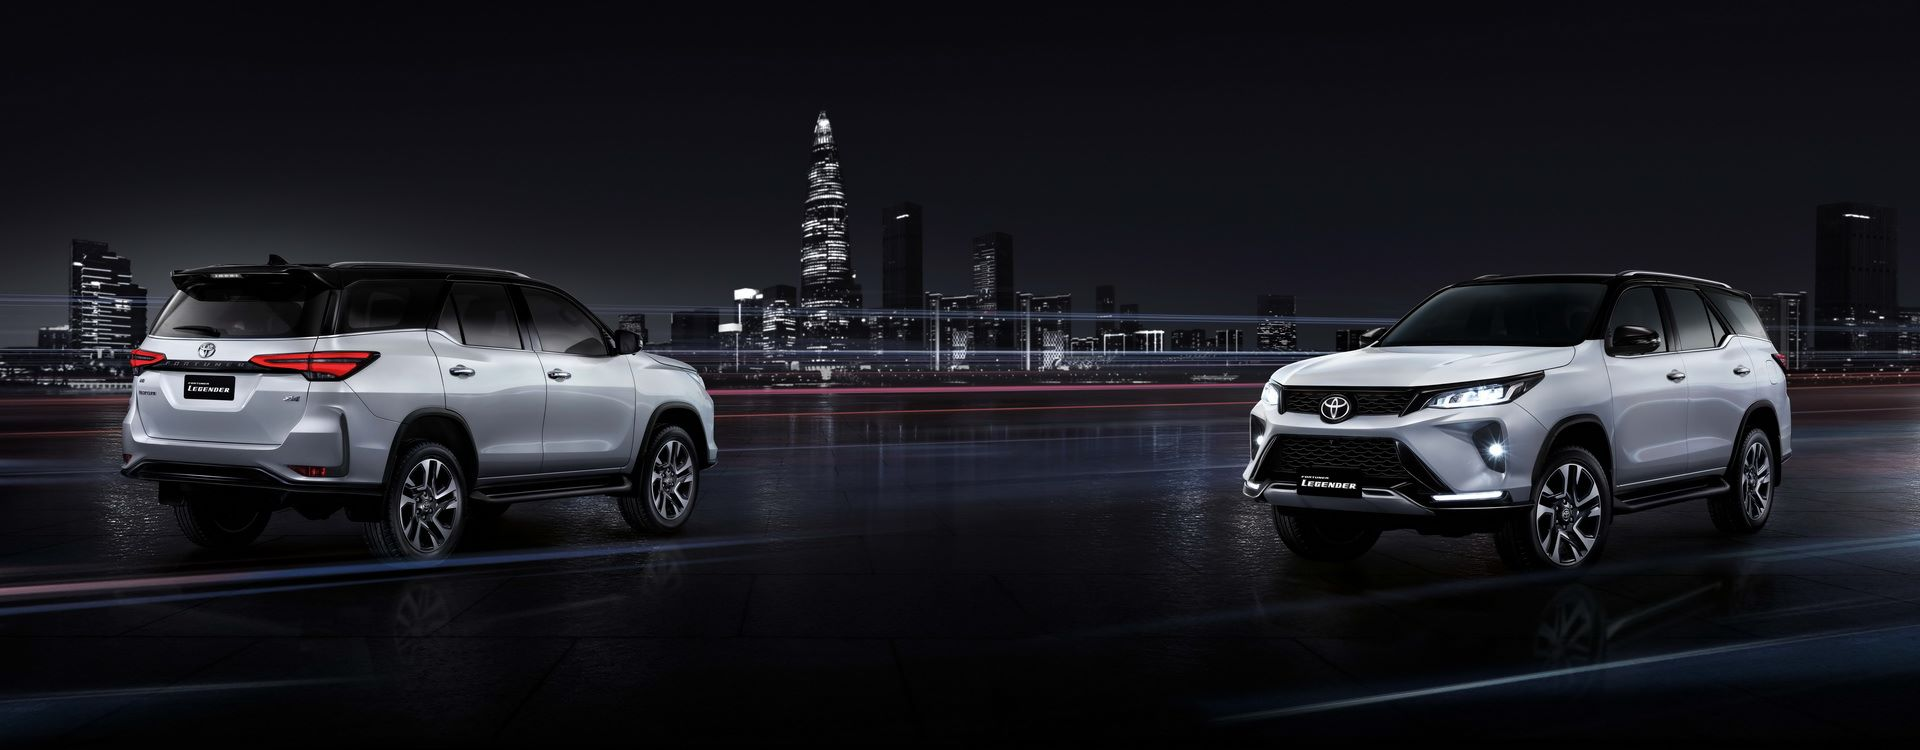 Toyota-Fortuner-2020-18